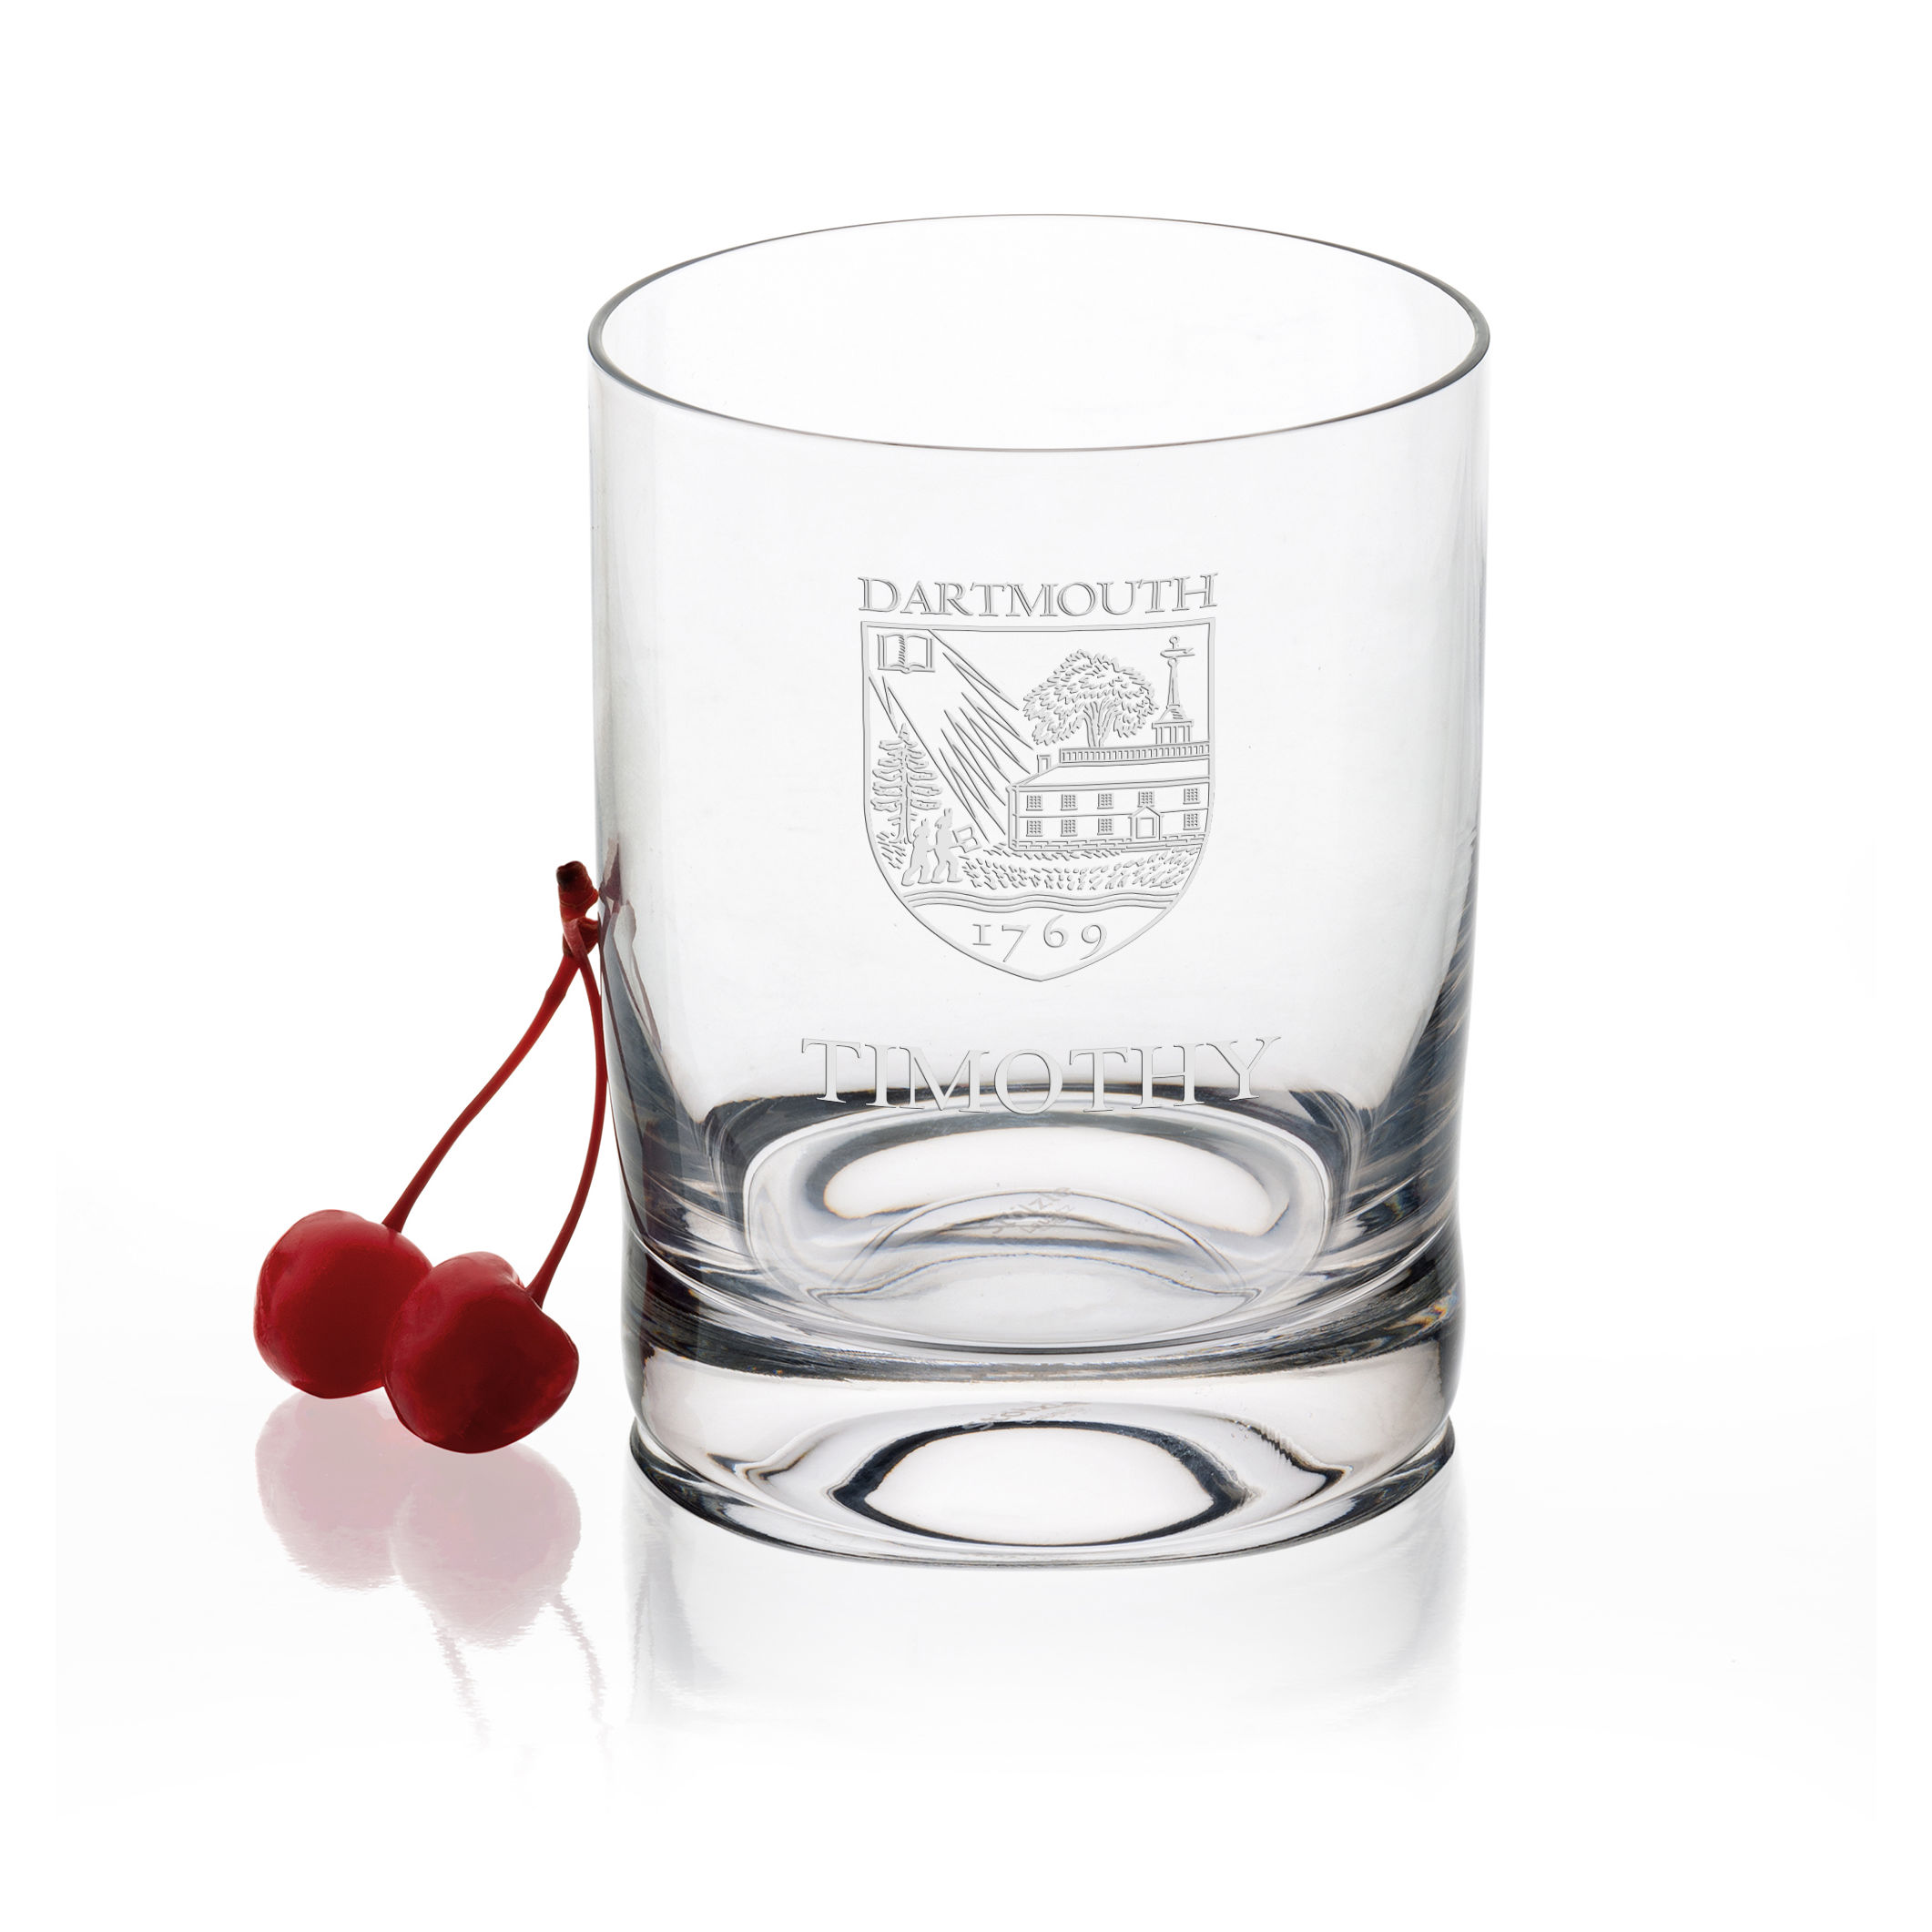 Dartmouth Tumbler Glasses - Set of 2